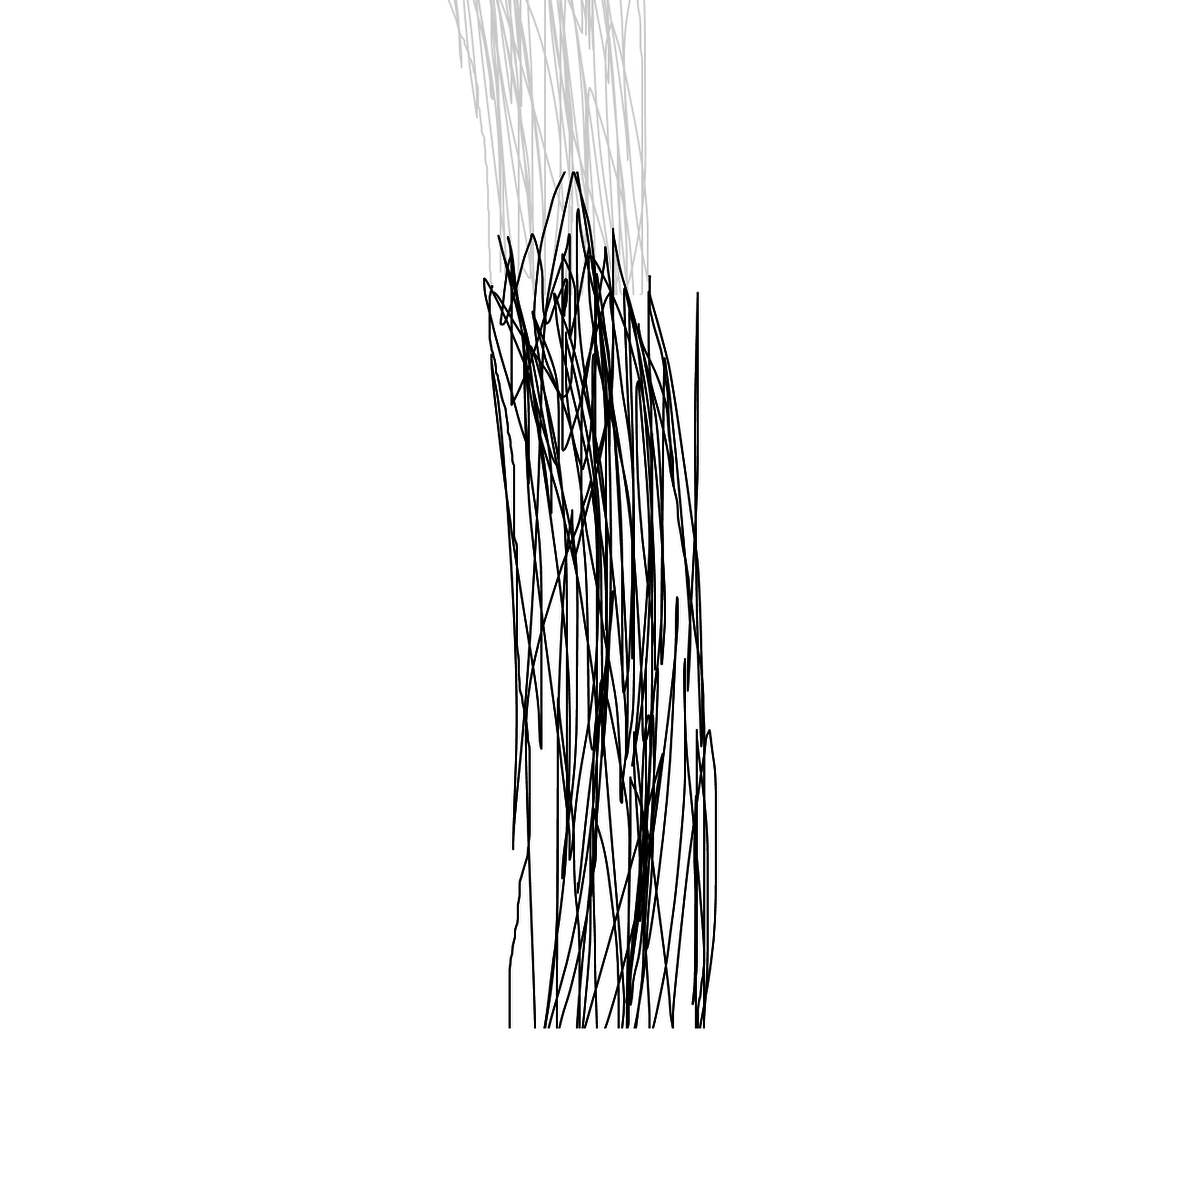 BAAAM drawing#11406 lat:52.4759178161621100lng: 13.4058074951171880